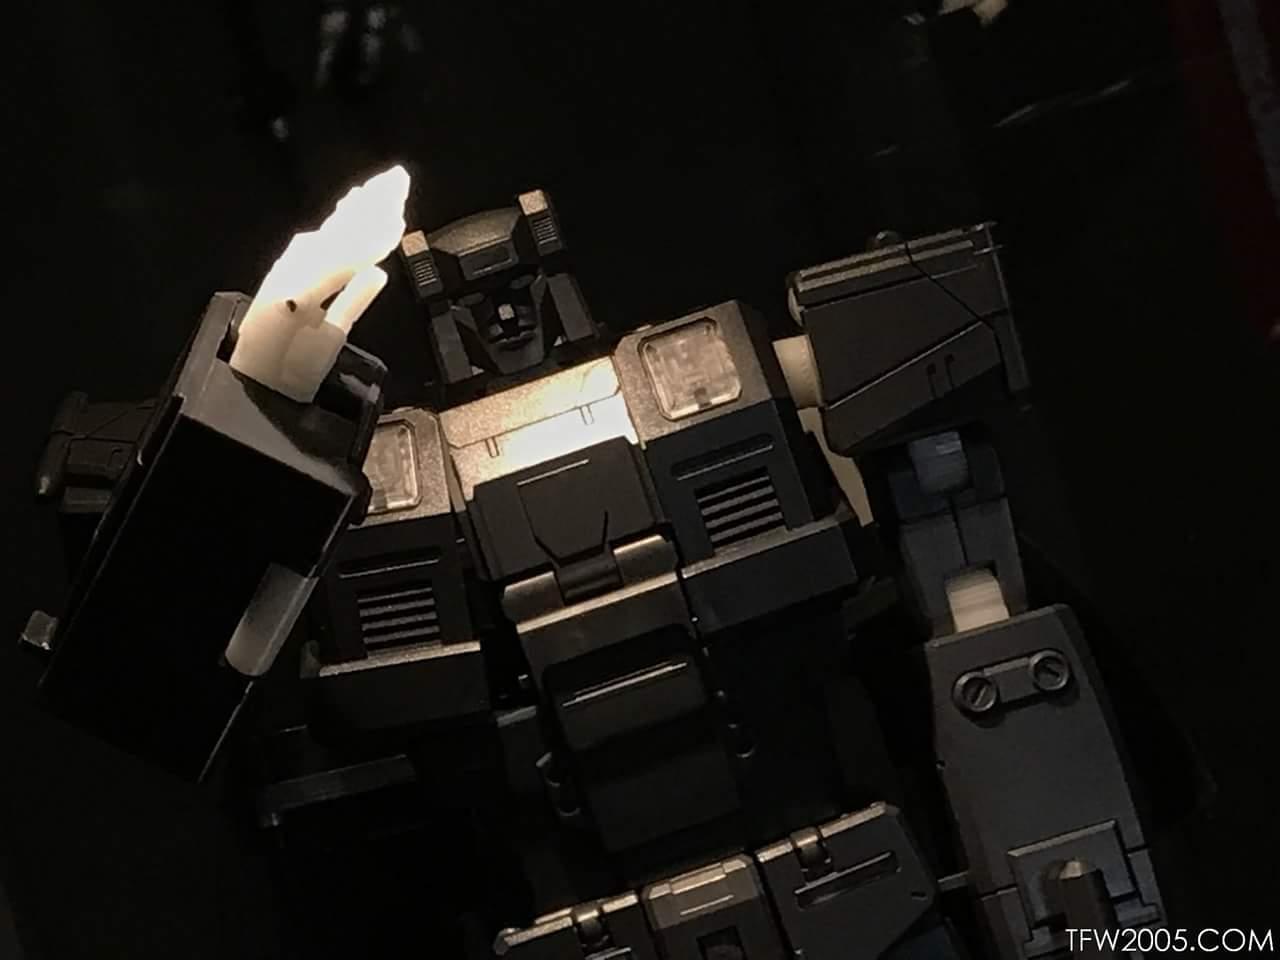 [Zeta Toys] Produit Tiers ― Kronos (ZB-01 à ZB-05) ― ZB-06|ZB-07 Superitron ― aka Superion - Page 2 W6Diq4yY_o